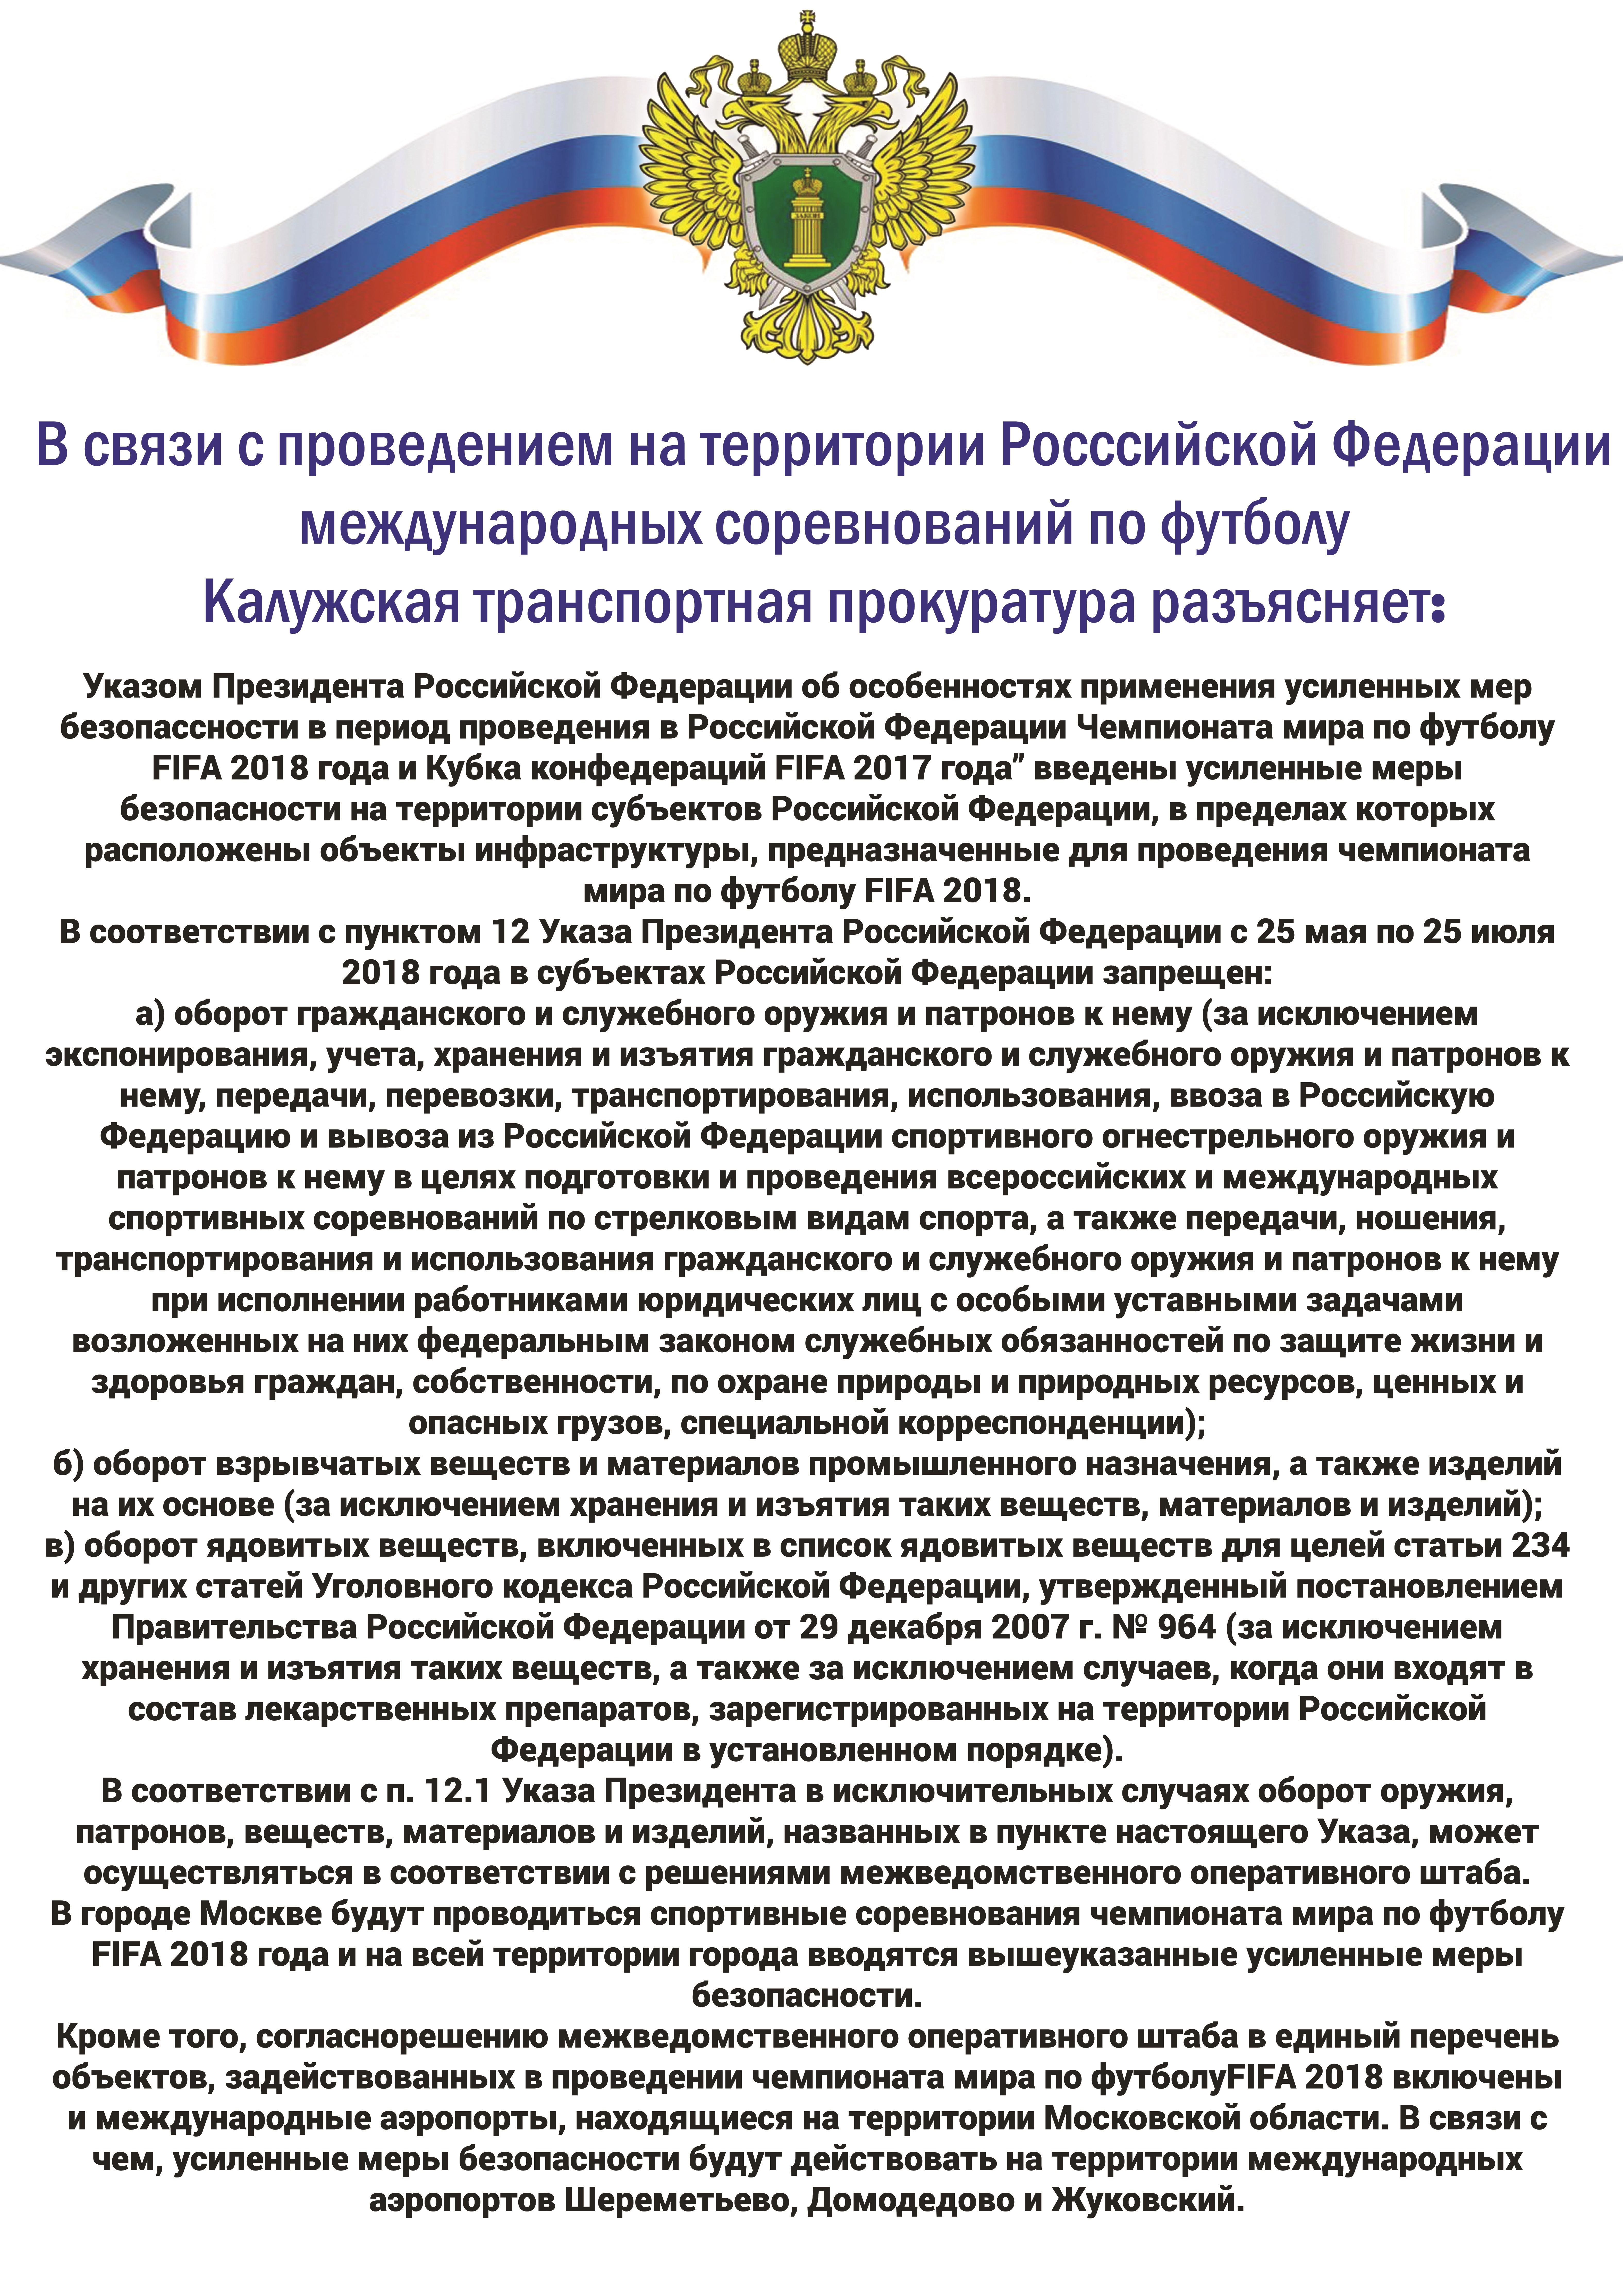 Официальный сайт города малоярославец | калужская транспортная.